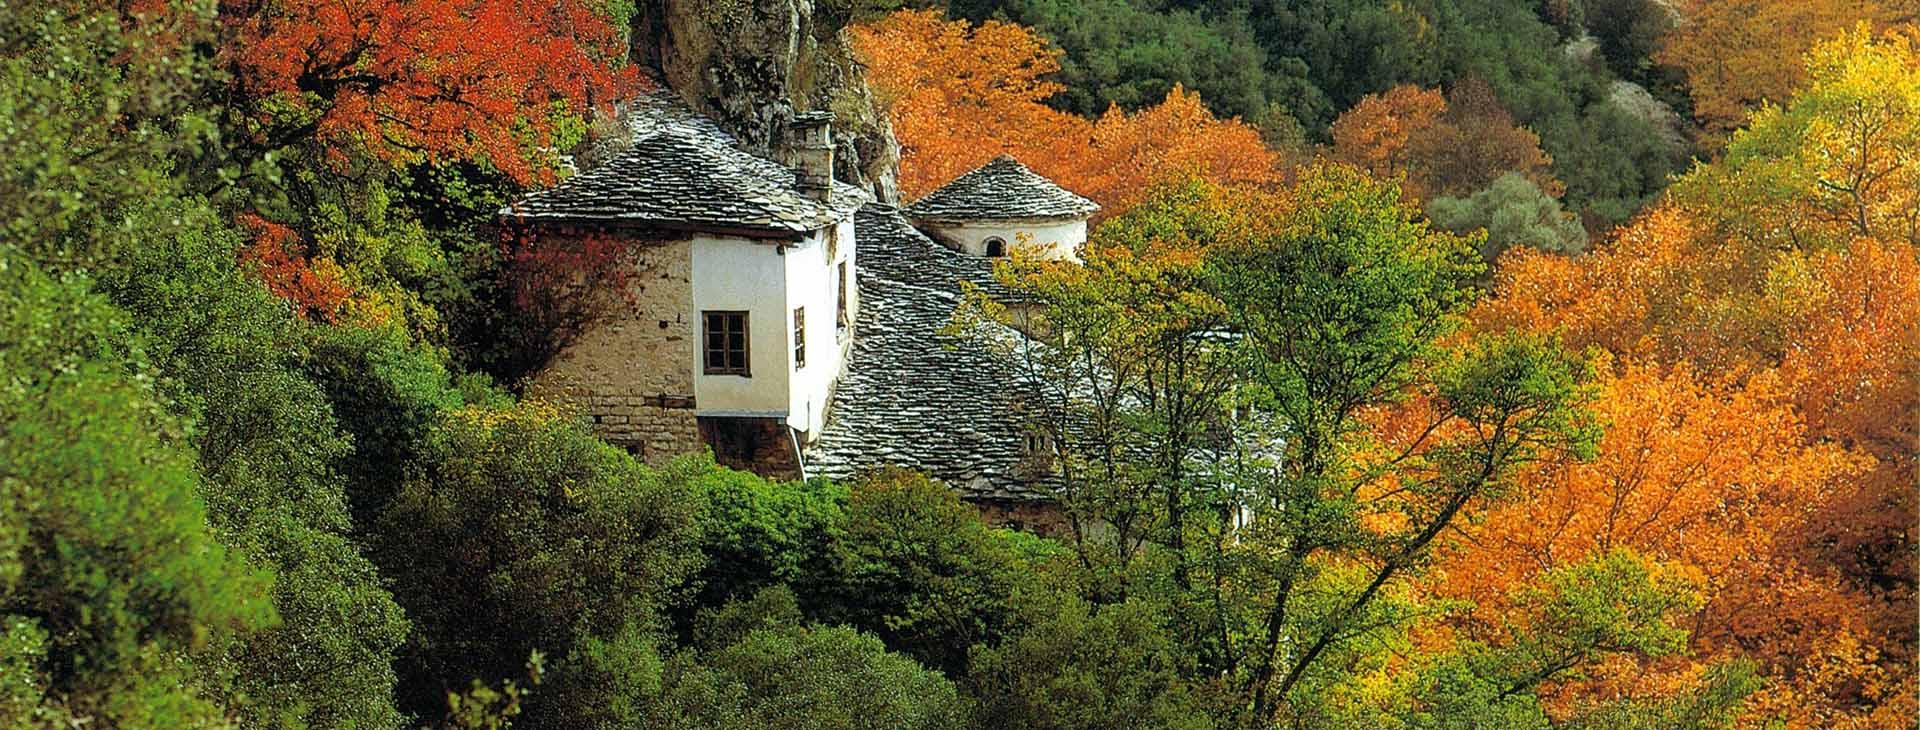 Zagori, Ioannina